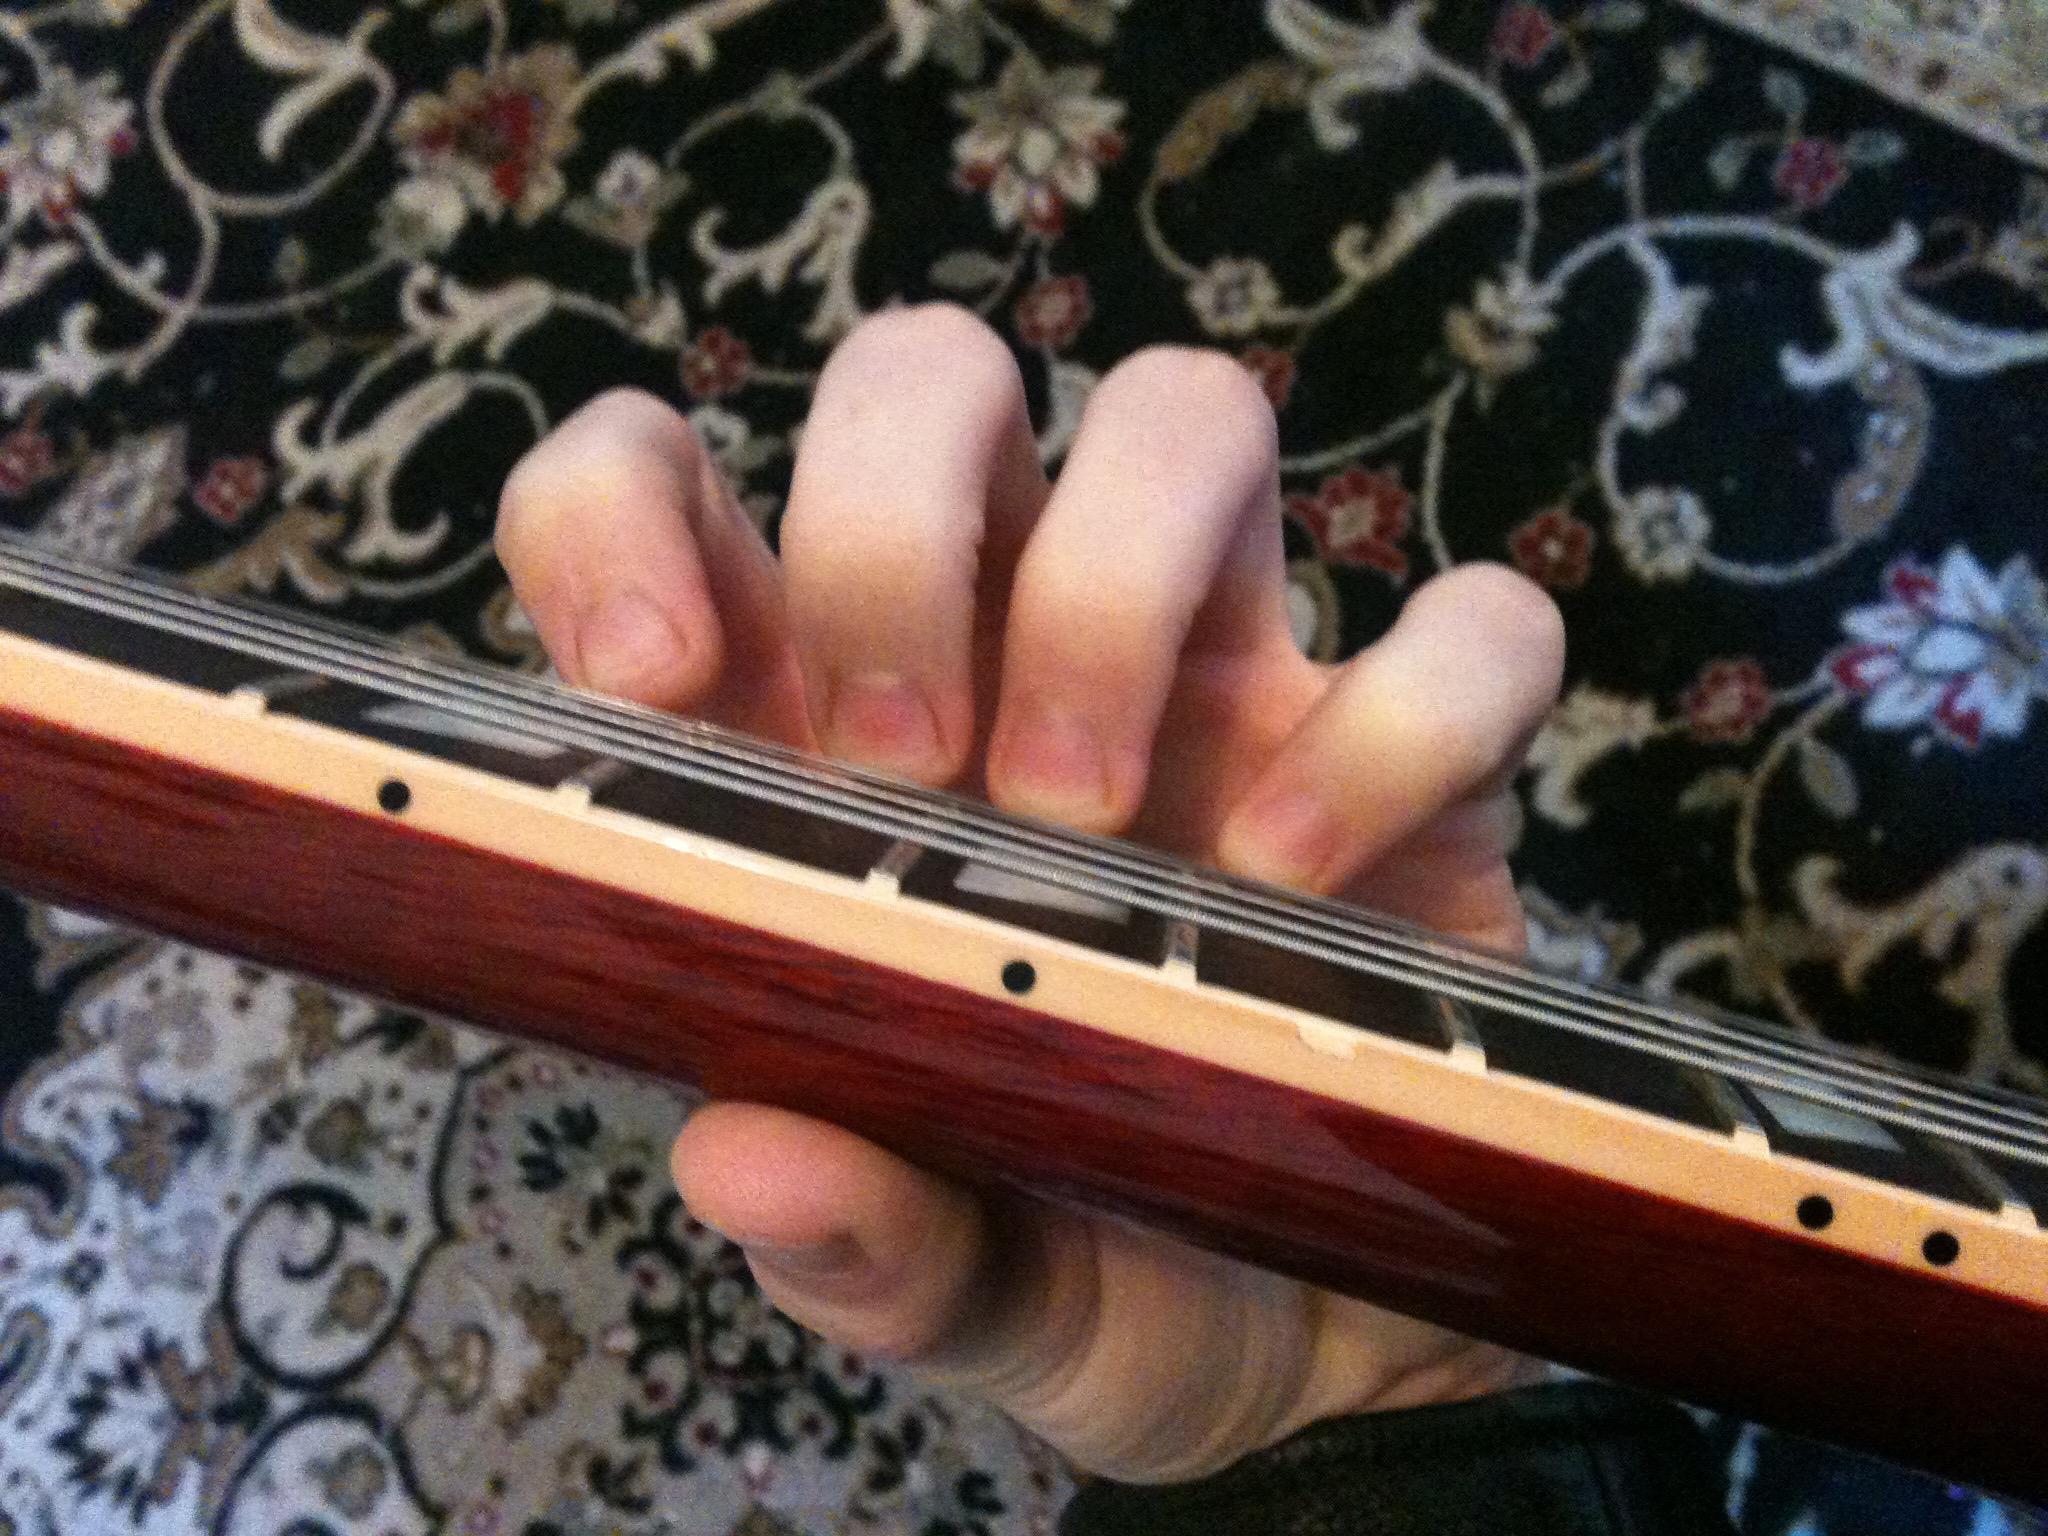 Legato Hand Postion, Fingers Curved, Finger Tips